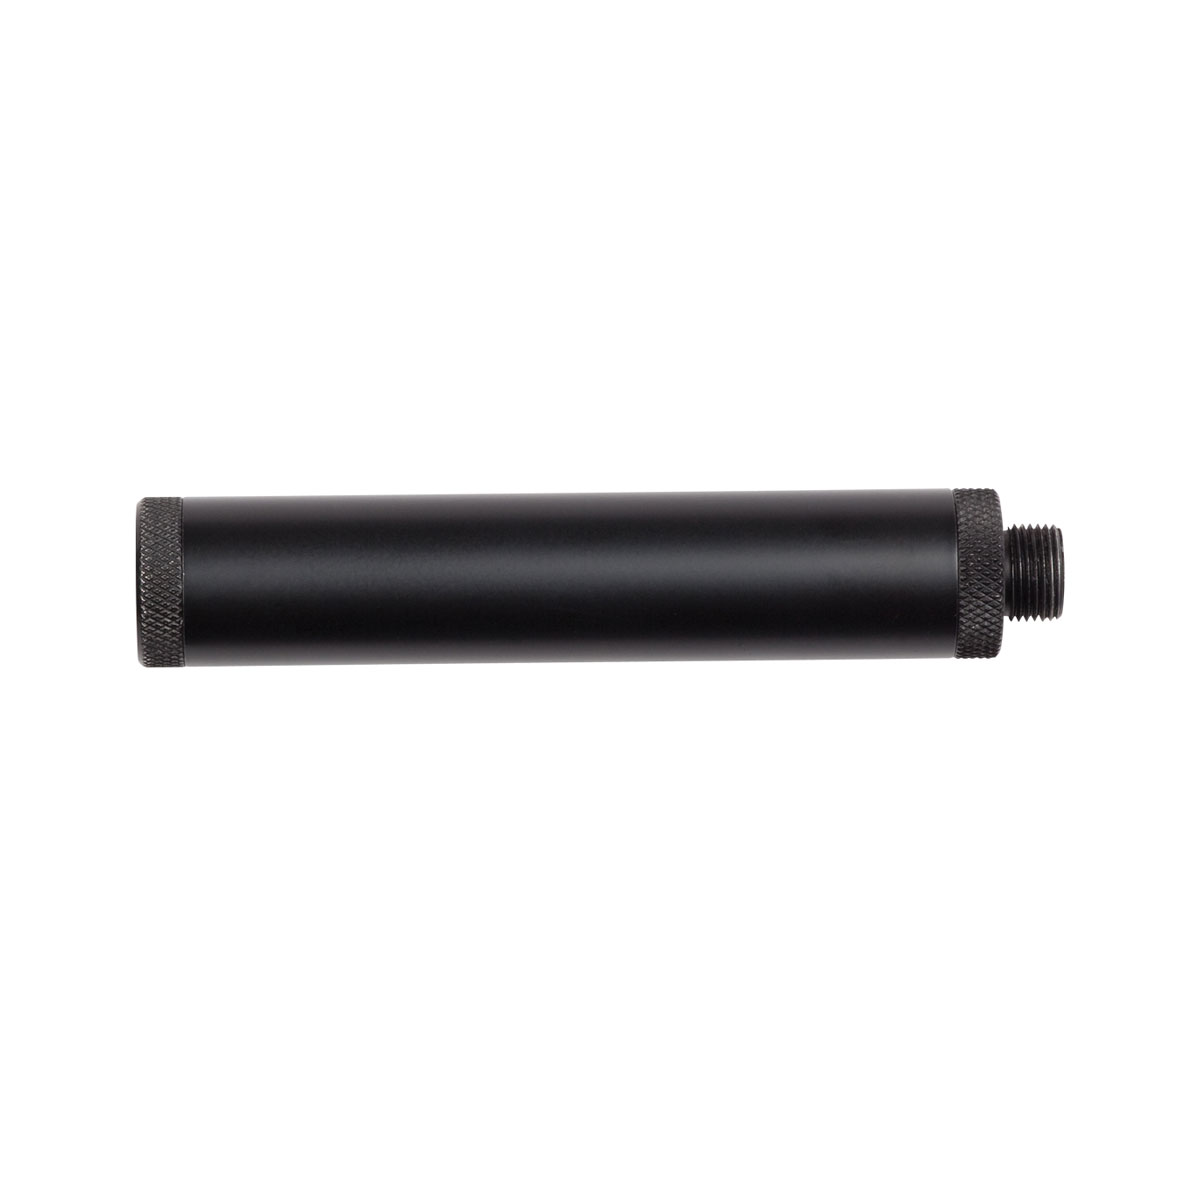 ASG имитация глушителя CZ 75D CompactRE-0094Характеристики:Материал: металл. Размер глушителя: 11 см х 2 см х 2 см. Размер упаковки: 14,5 см х 6 см х 3,5 см.